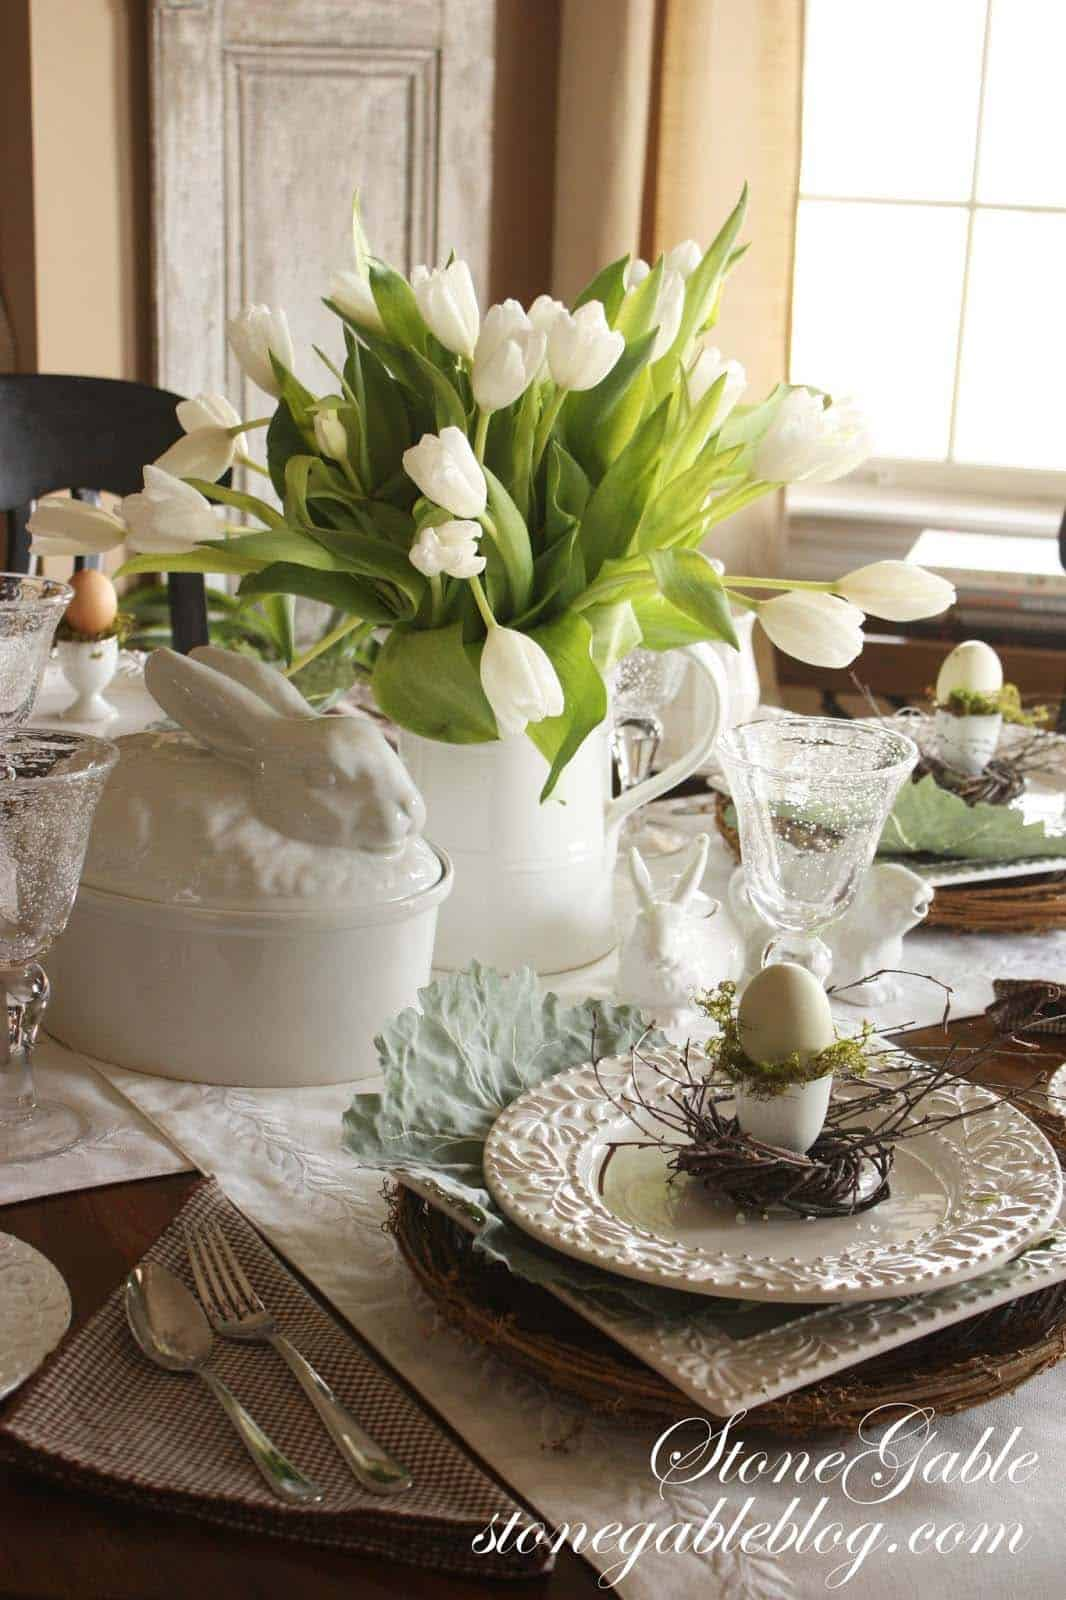 Inspiring Easter Table Centerpiece Ideas-30-1 Kindesign